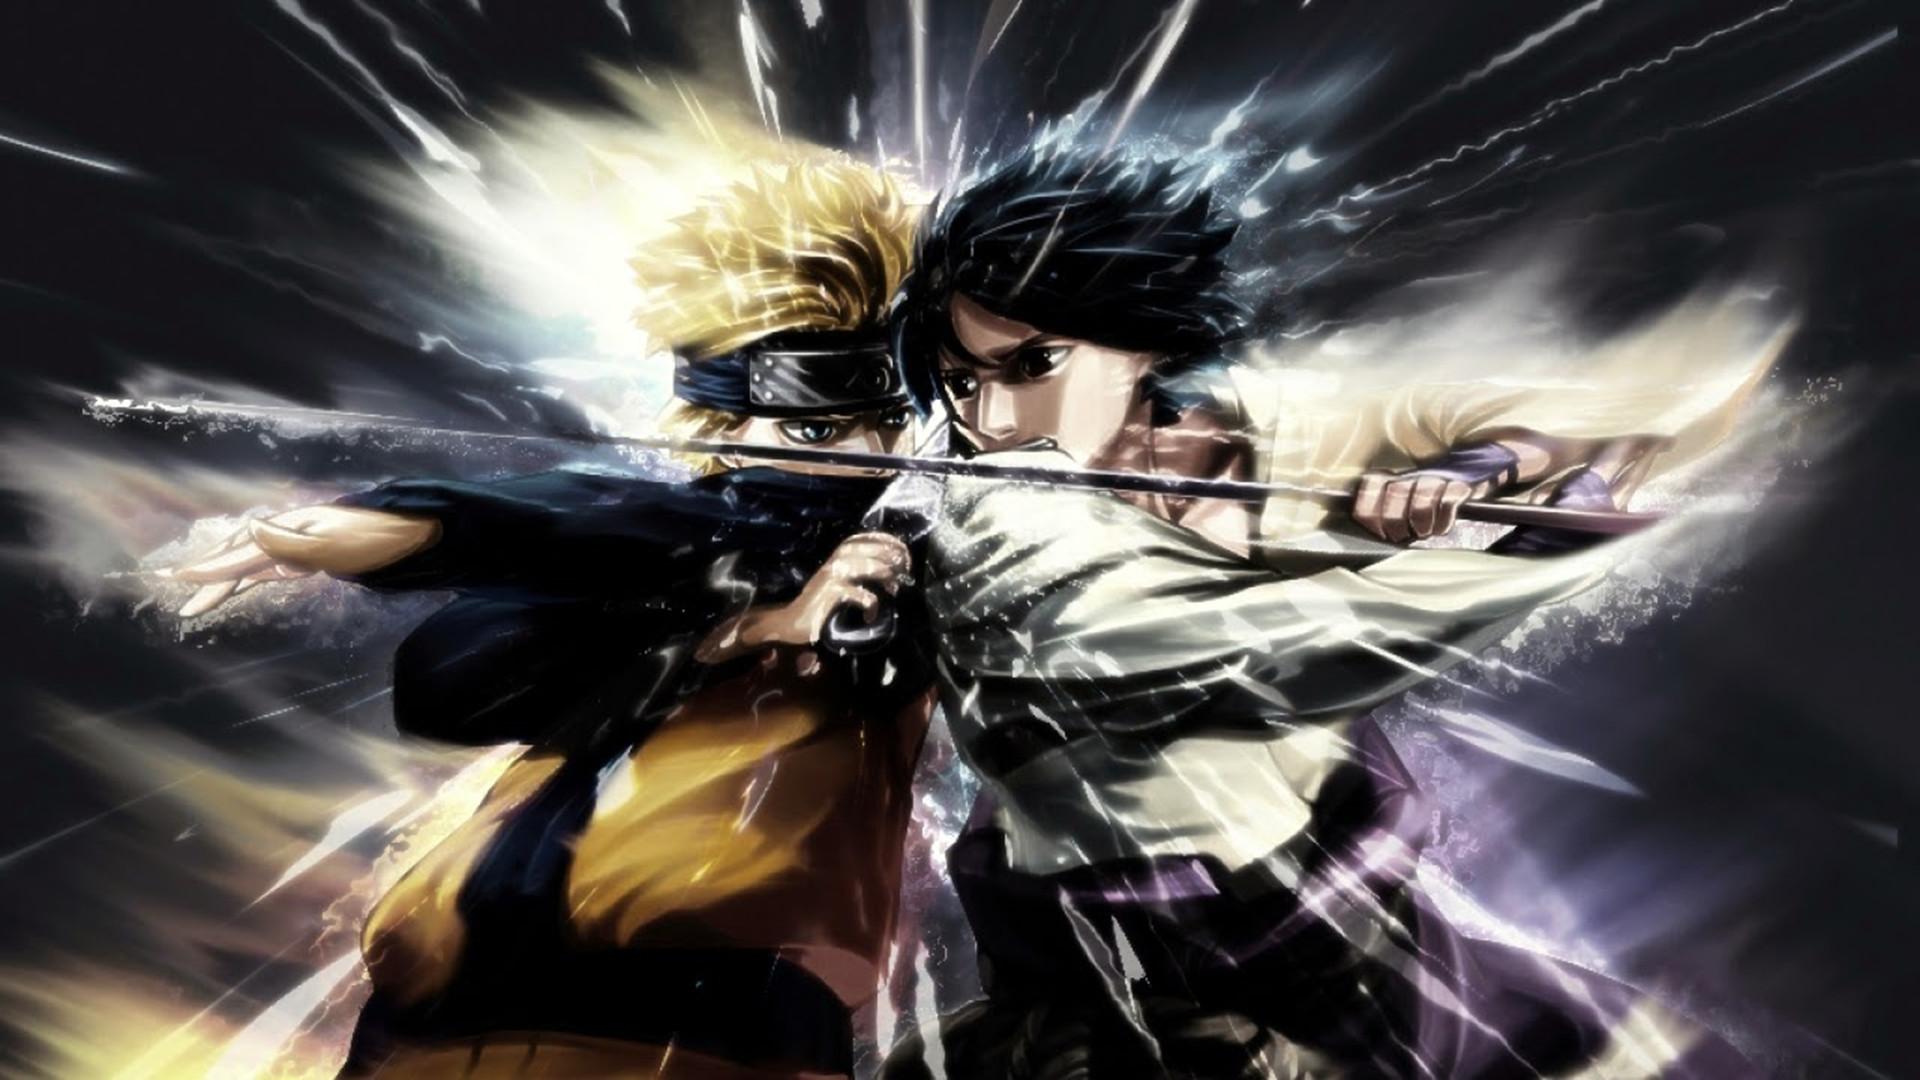 Naruto vs Sasuke Fighting HD desktop wallpaper : Widescreen Imagenes De  Naruto Y Sasuke Wallpapers Wallpapers)